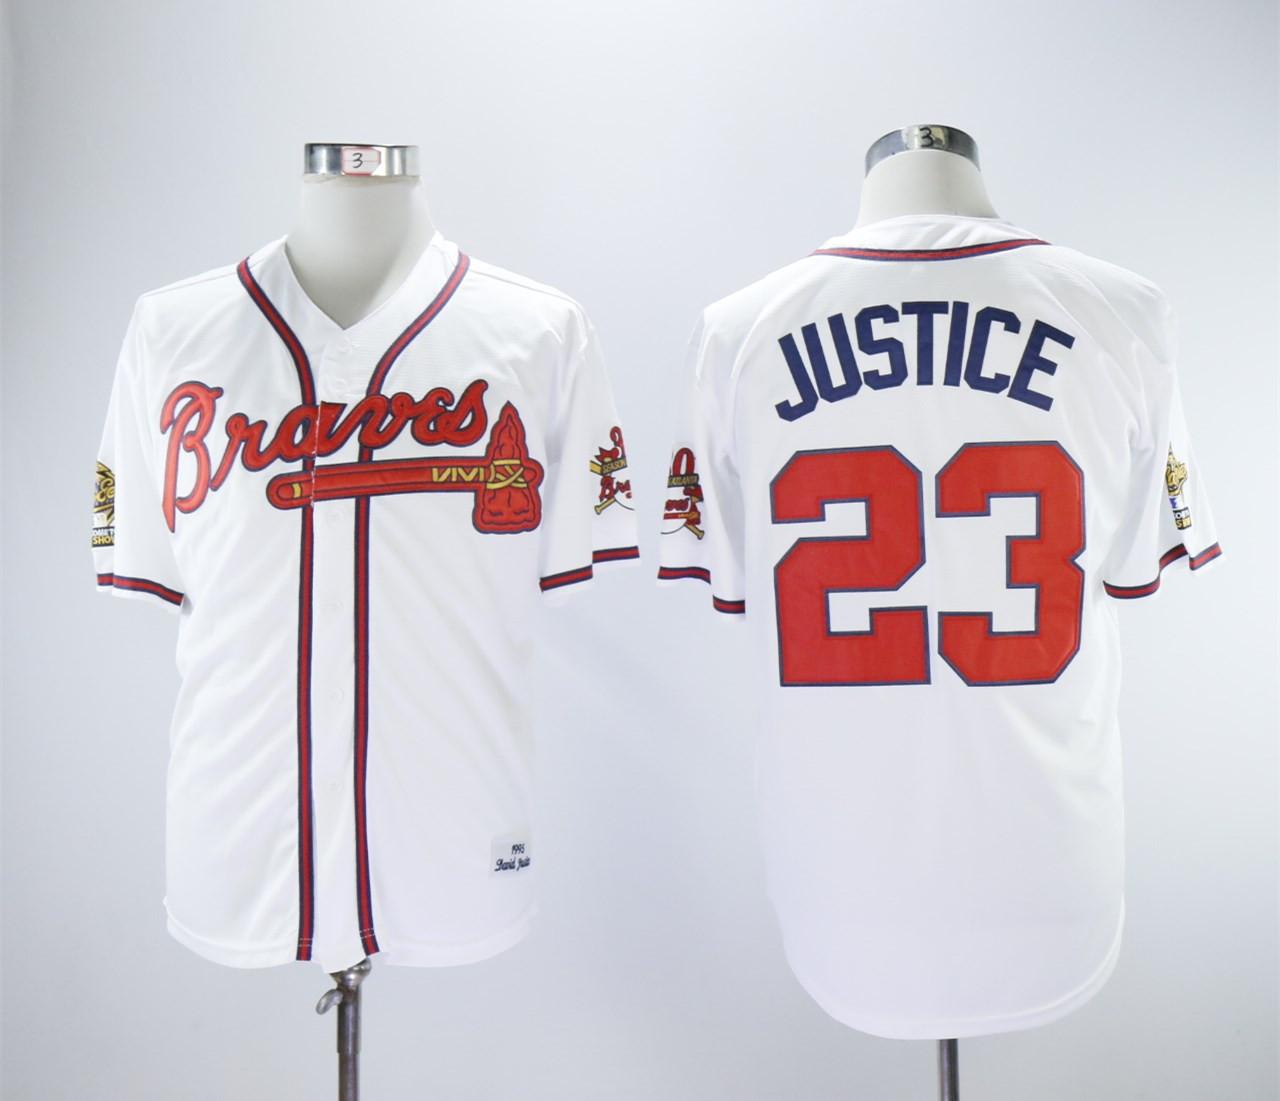 Braves 23 David Justice White 1993 Throwback Jersey